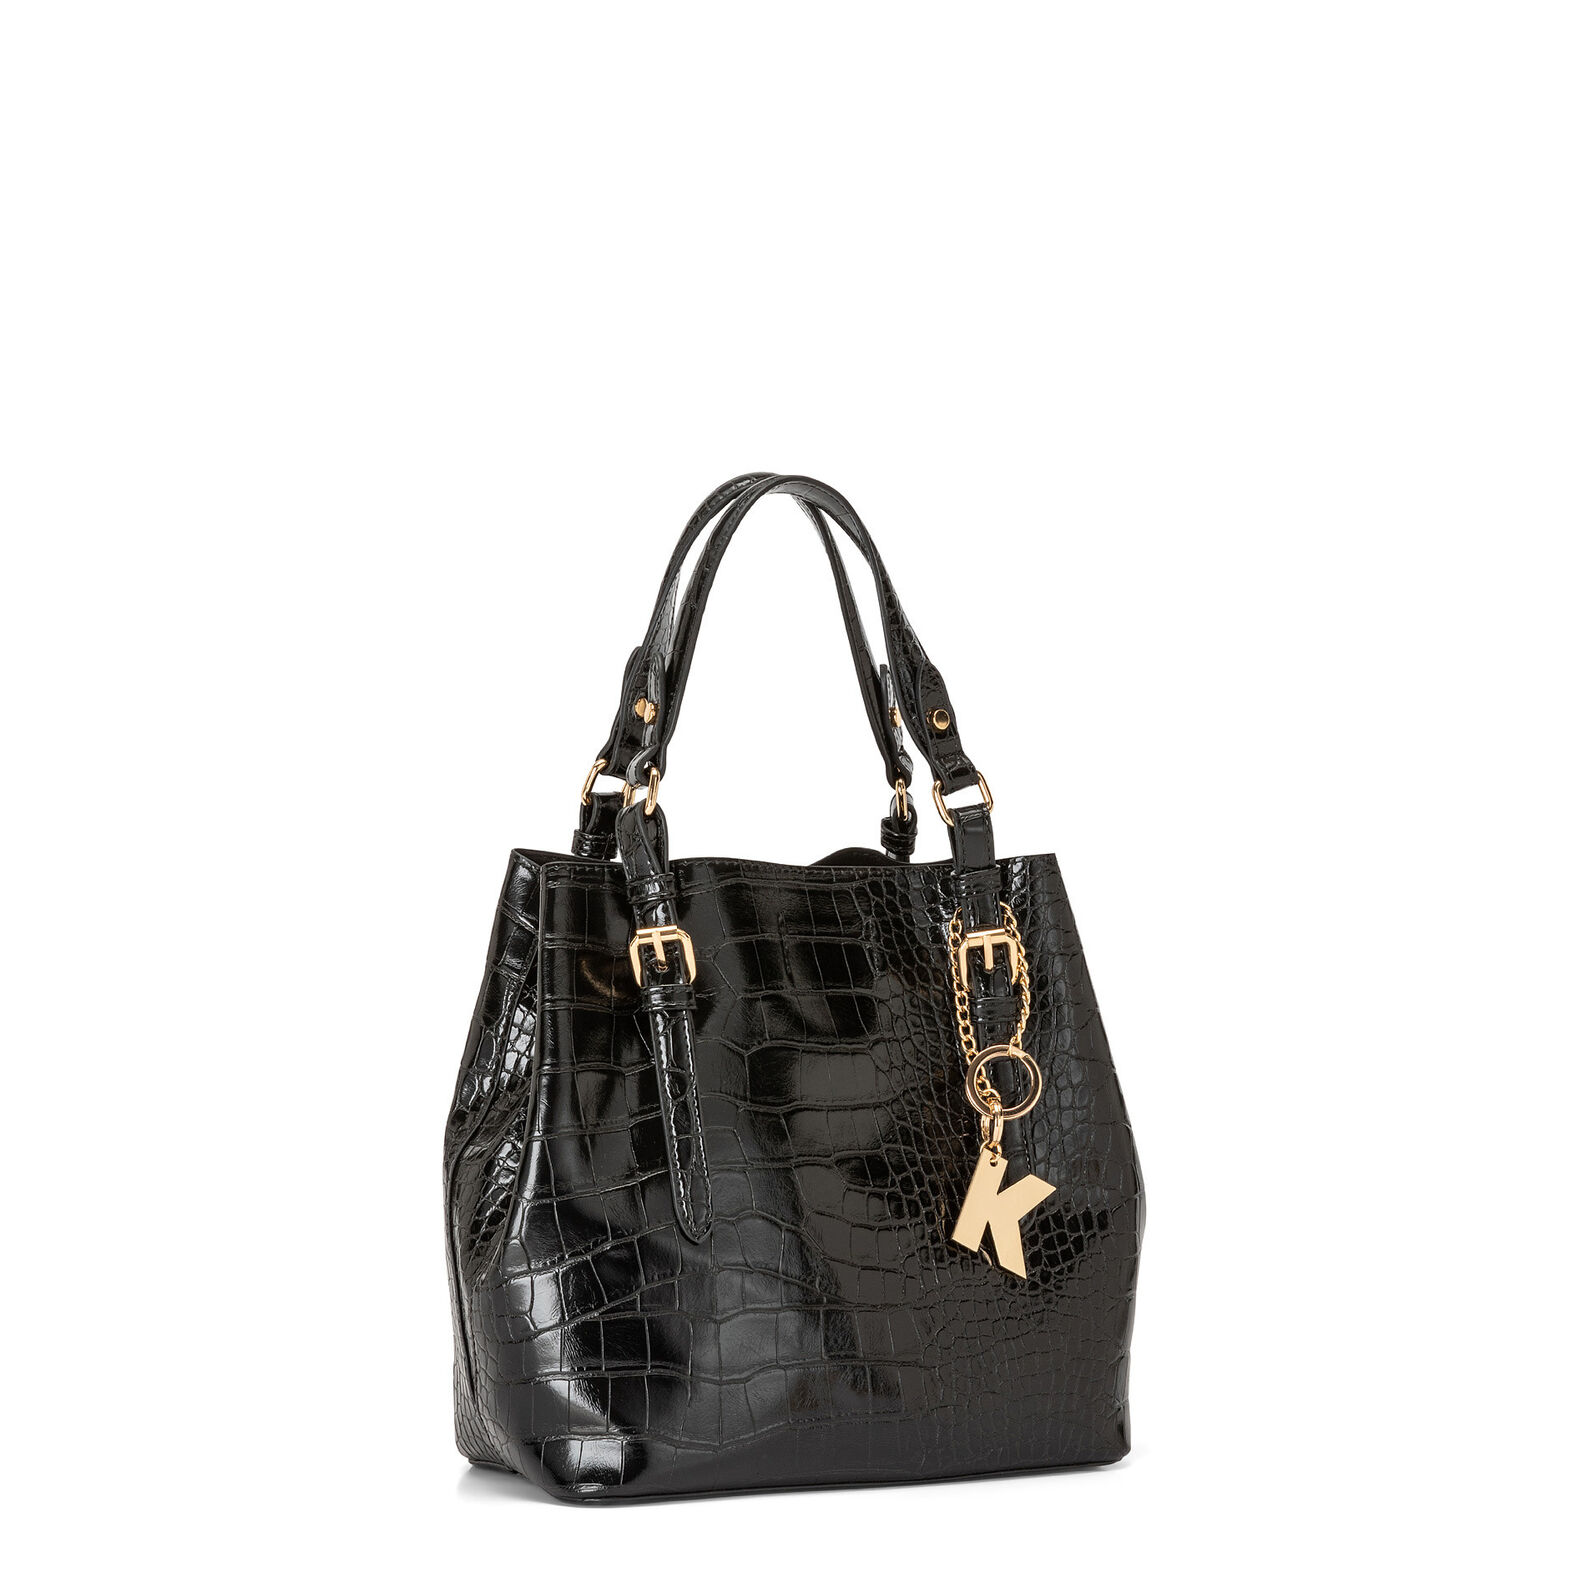 Koan croc print handbag